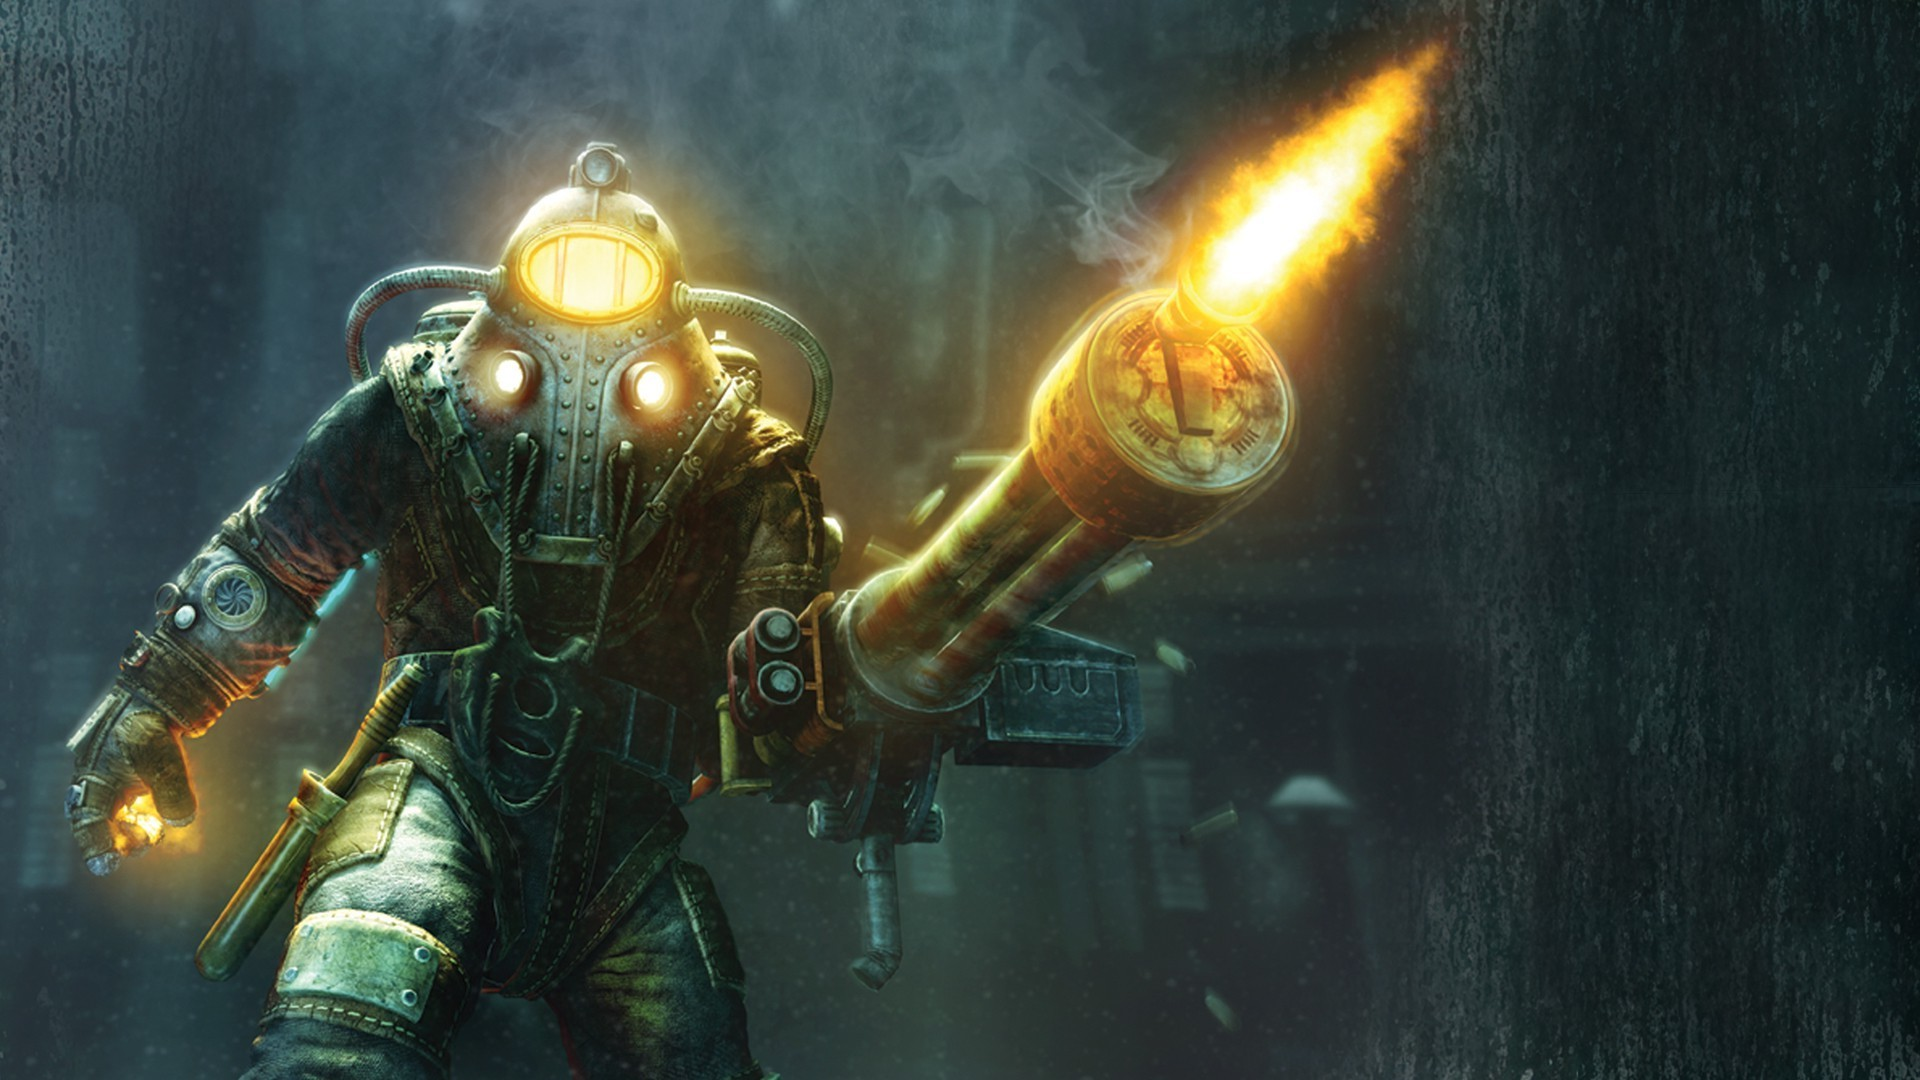 BioShock 2, Video Games, Big Daddy, Rapture, Sea